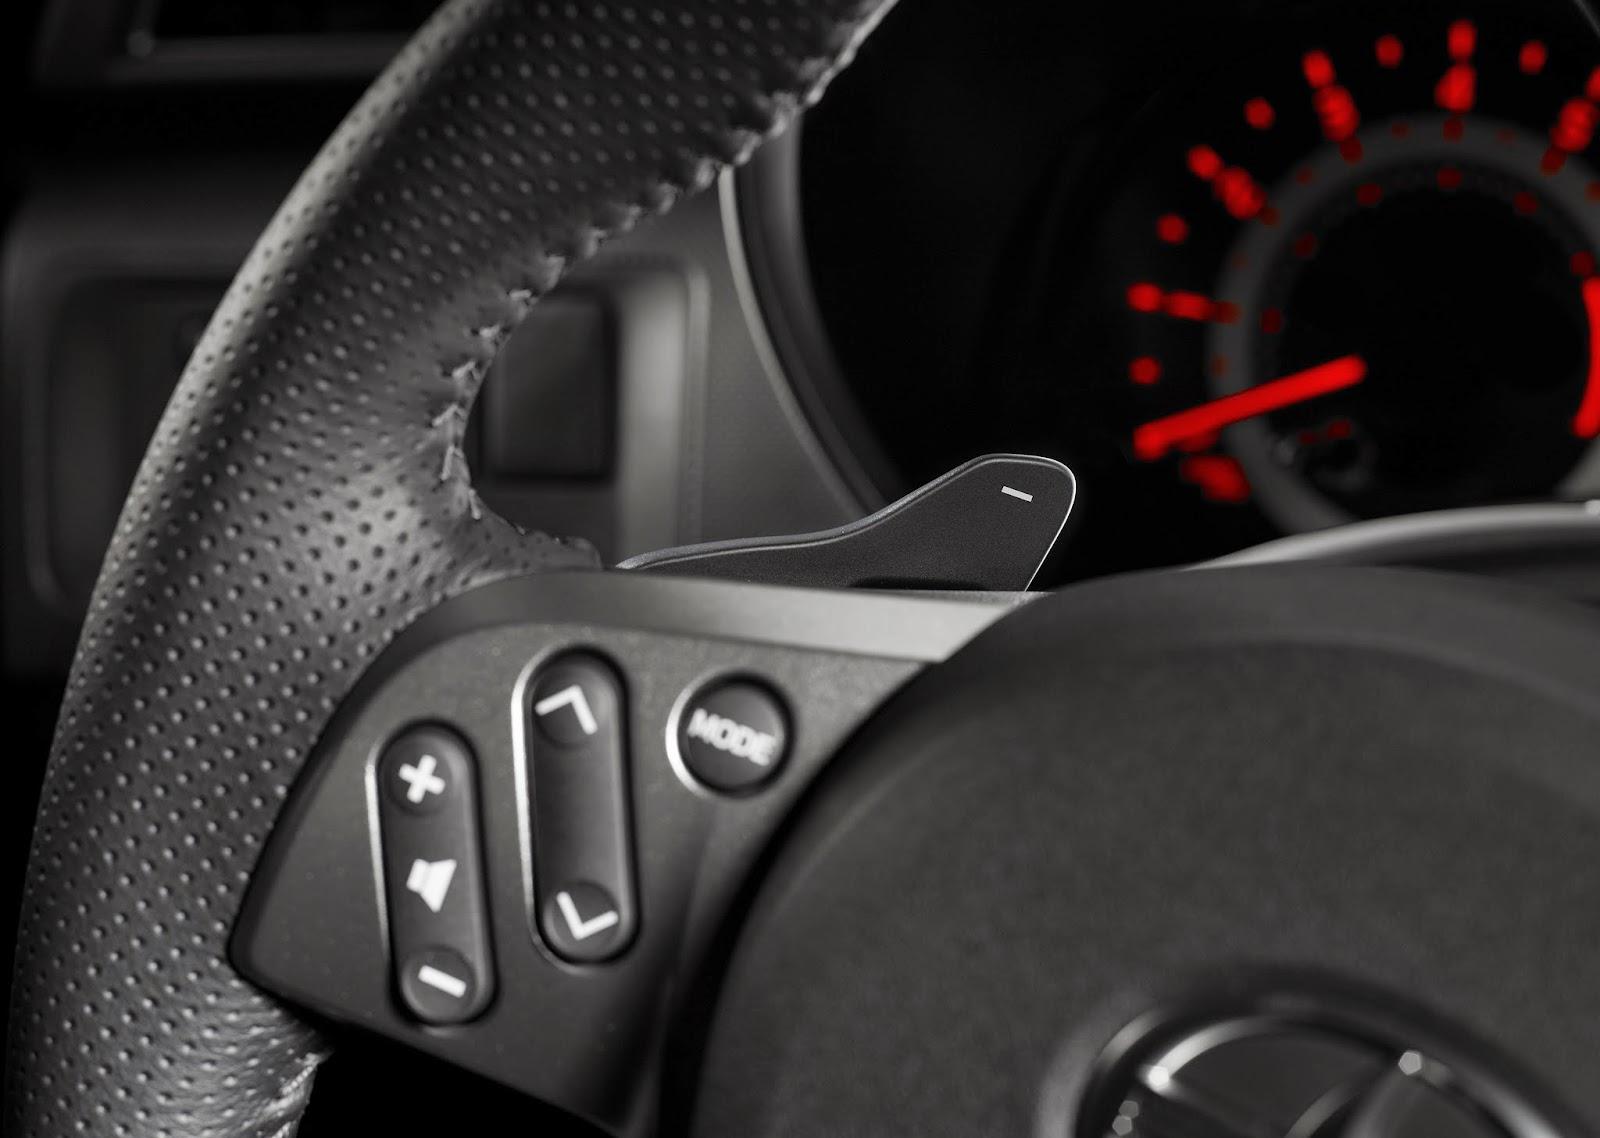 Steering wheel detail of 2015 Scion tC